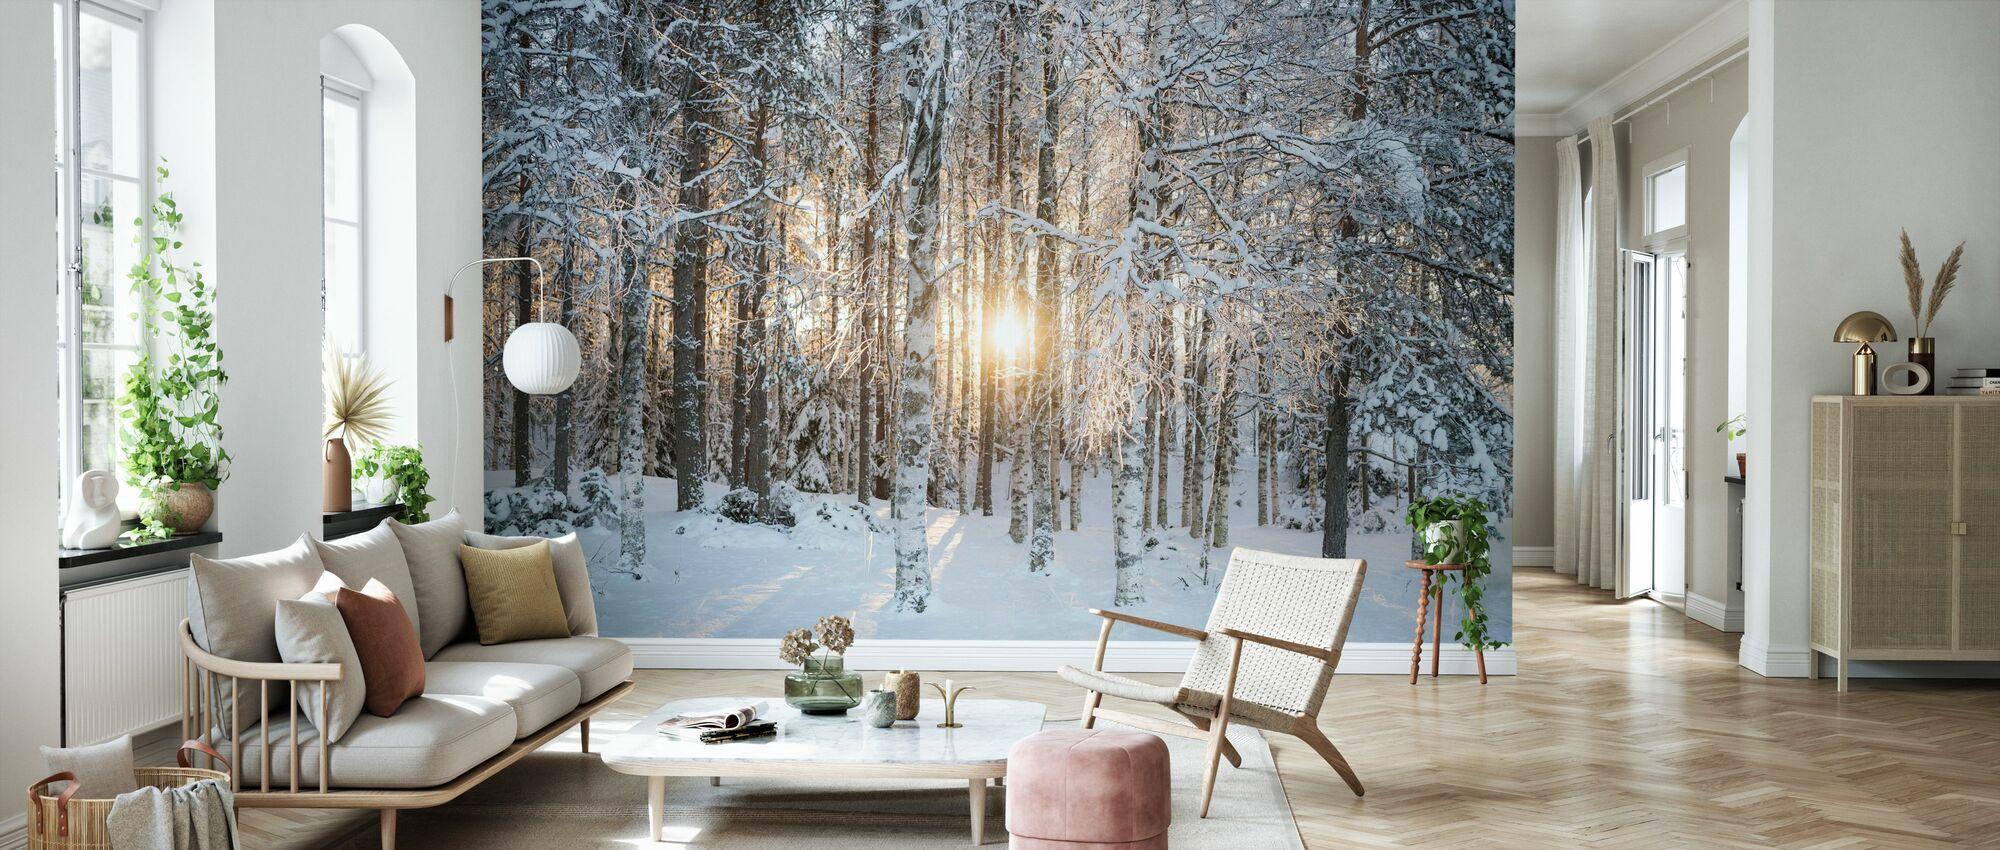 Winter Birches - Wallpaper - Living Room